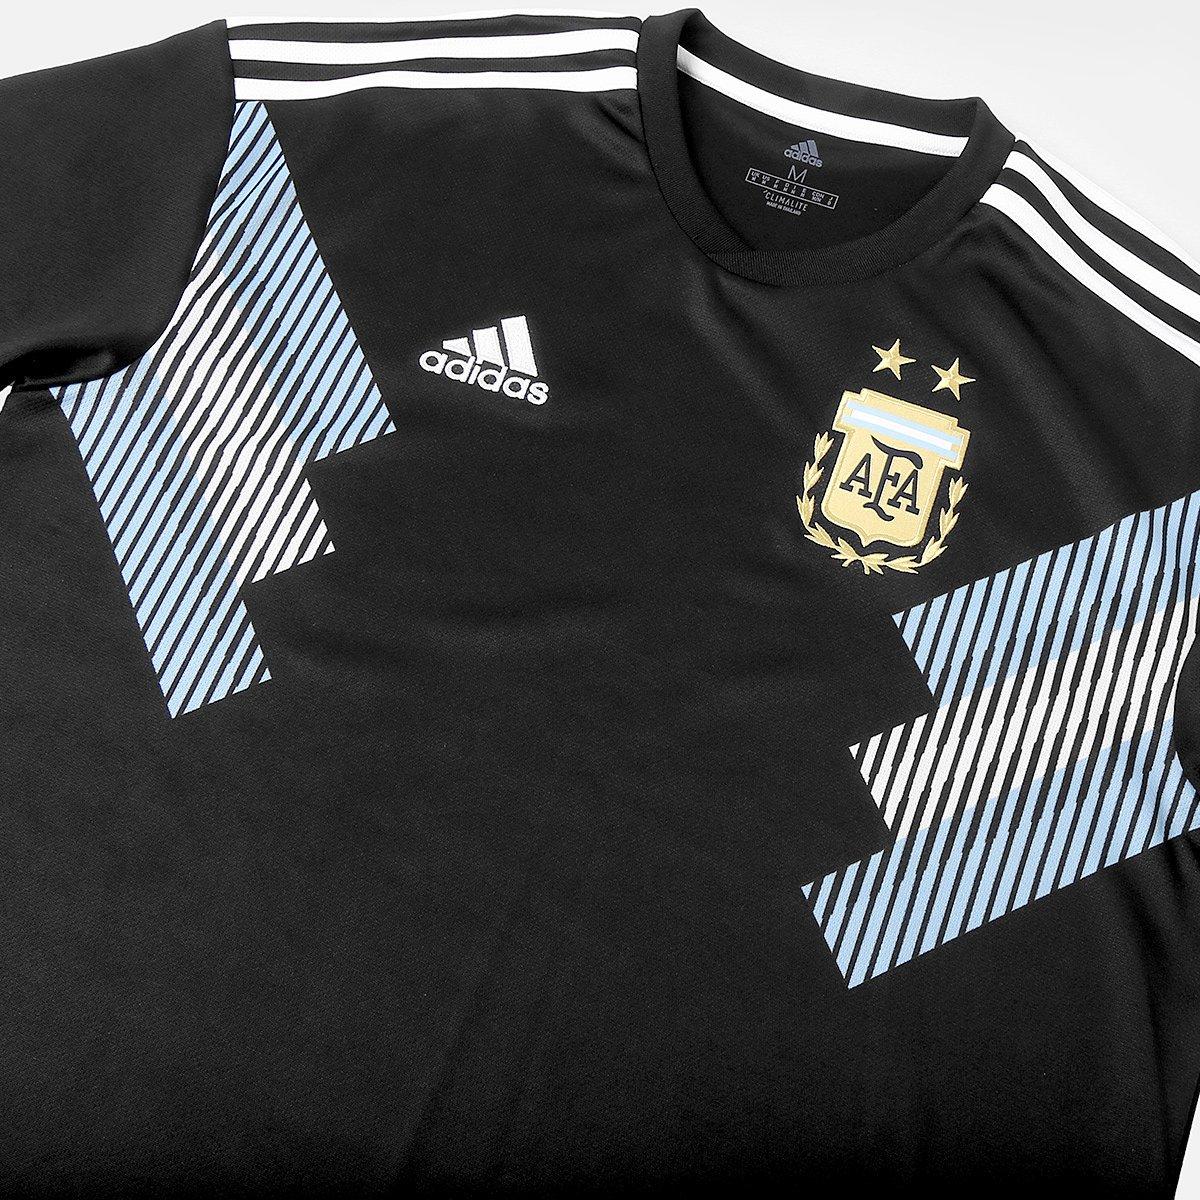 Camisa Seleção Argentina Away 18 19 s n° - Torcedor Adidas Masculina ... 85536fca9fc40